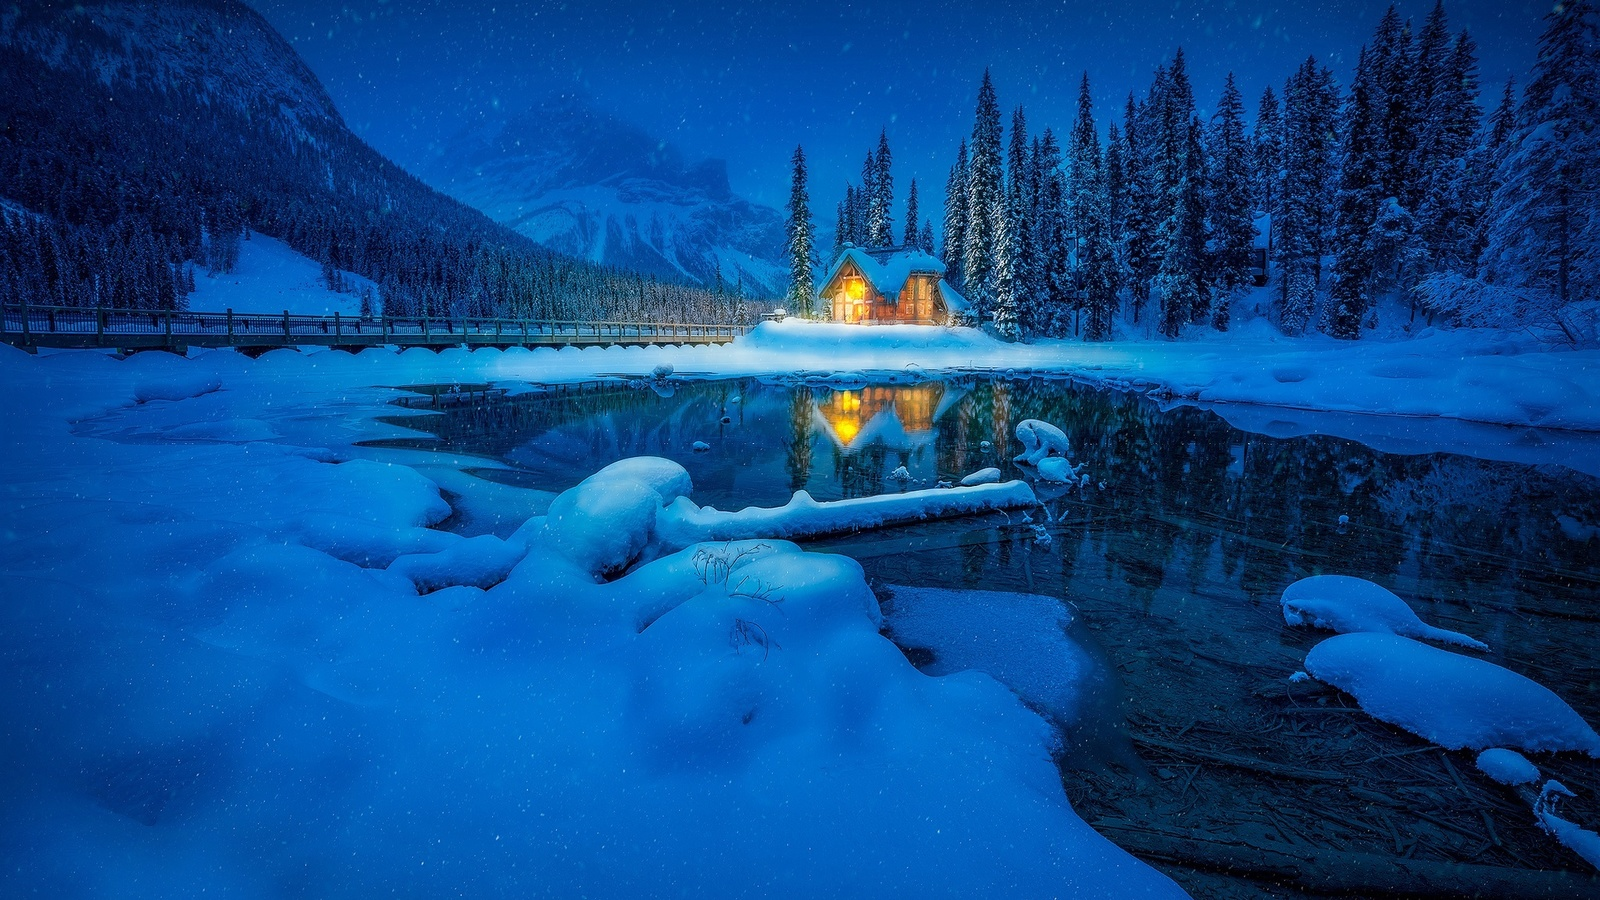 yoho, national park, канада, зима, домик, красиво, снег, ночь, горы